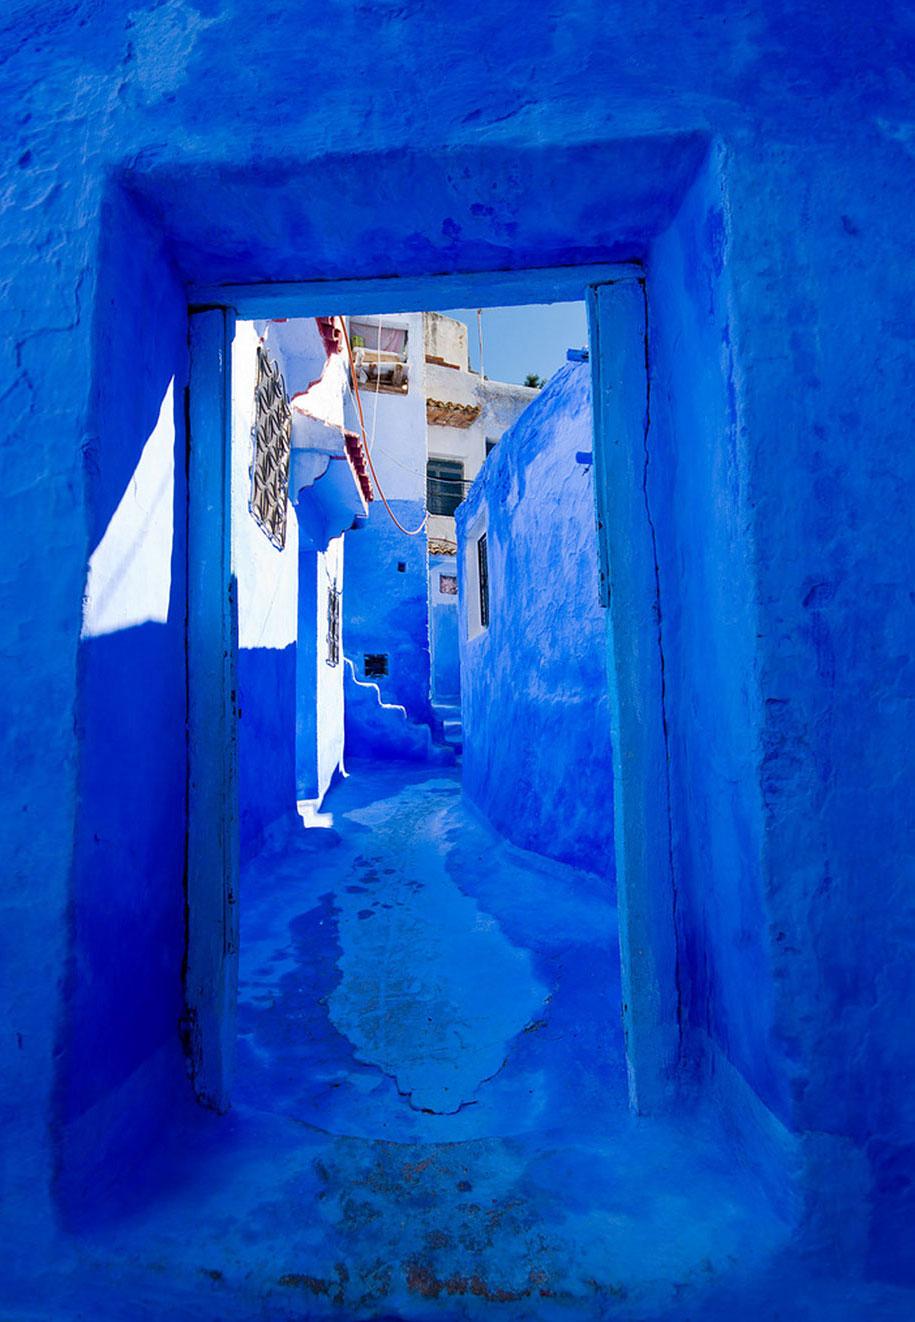 blue-town-walls-chefchaouen-morocco-12